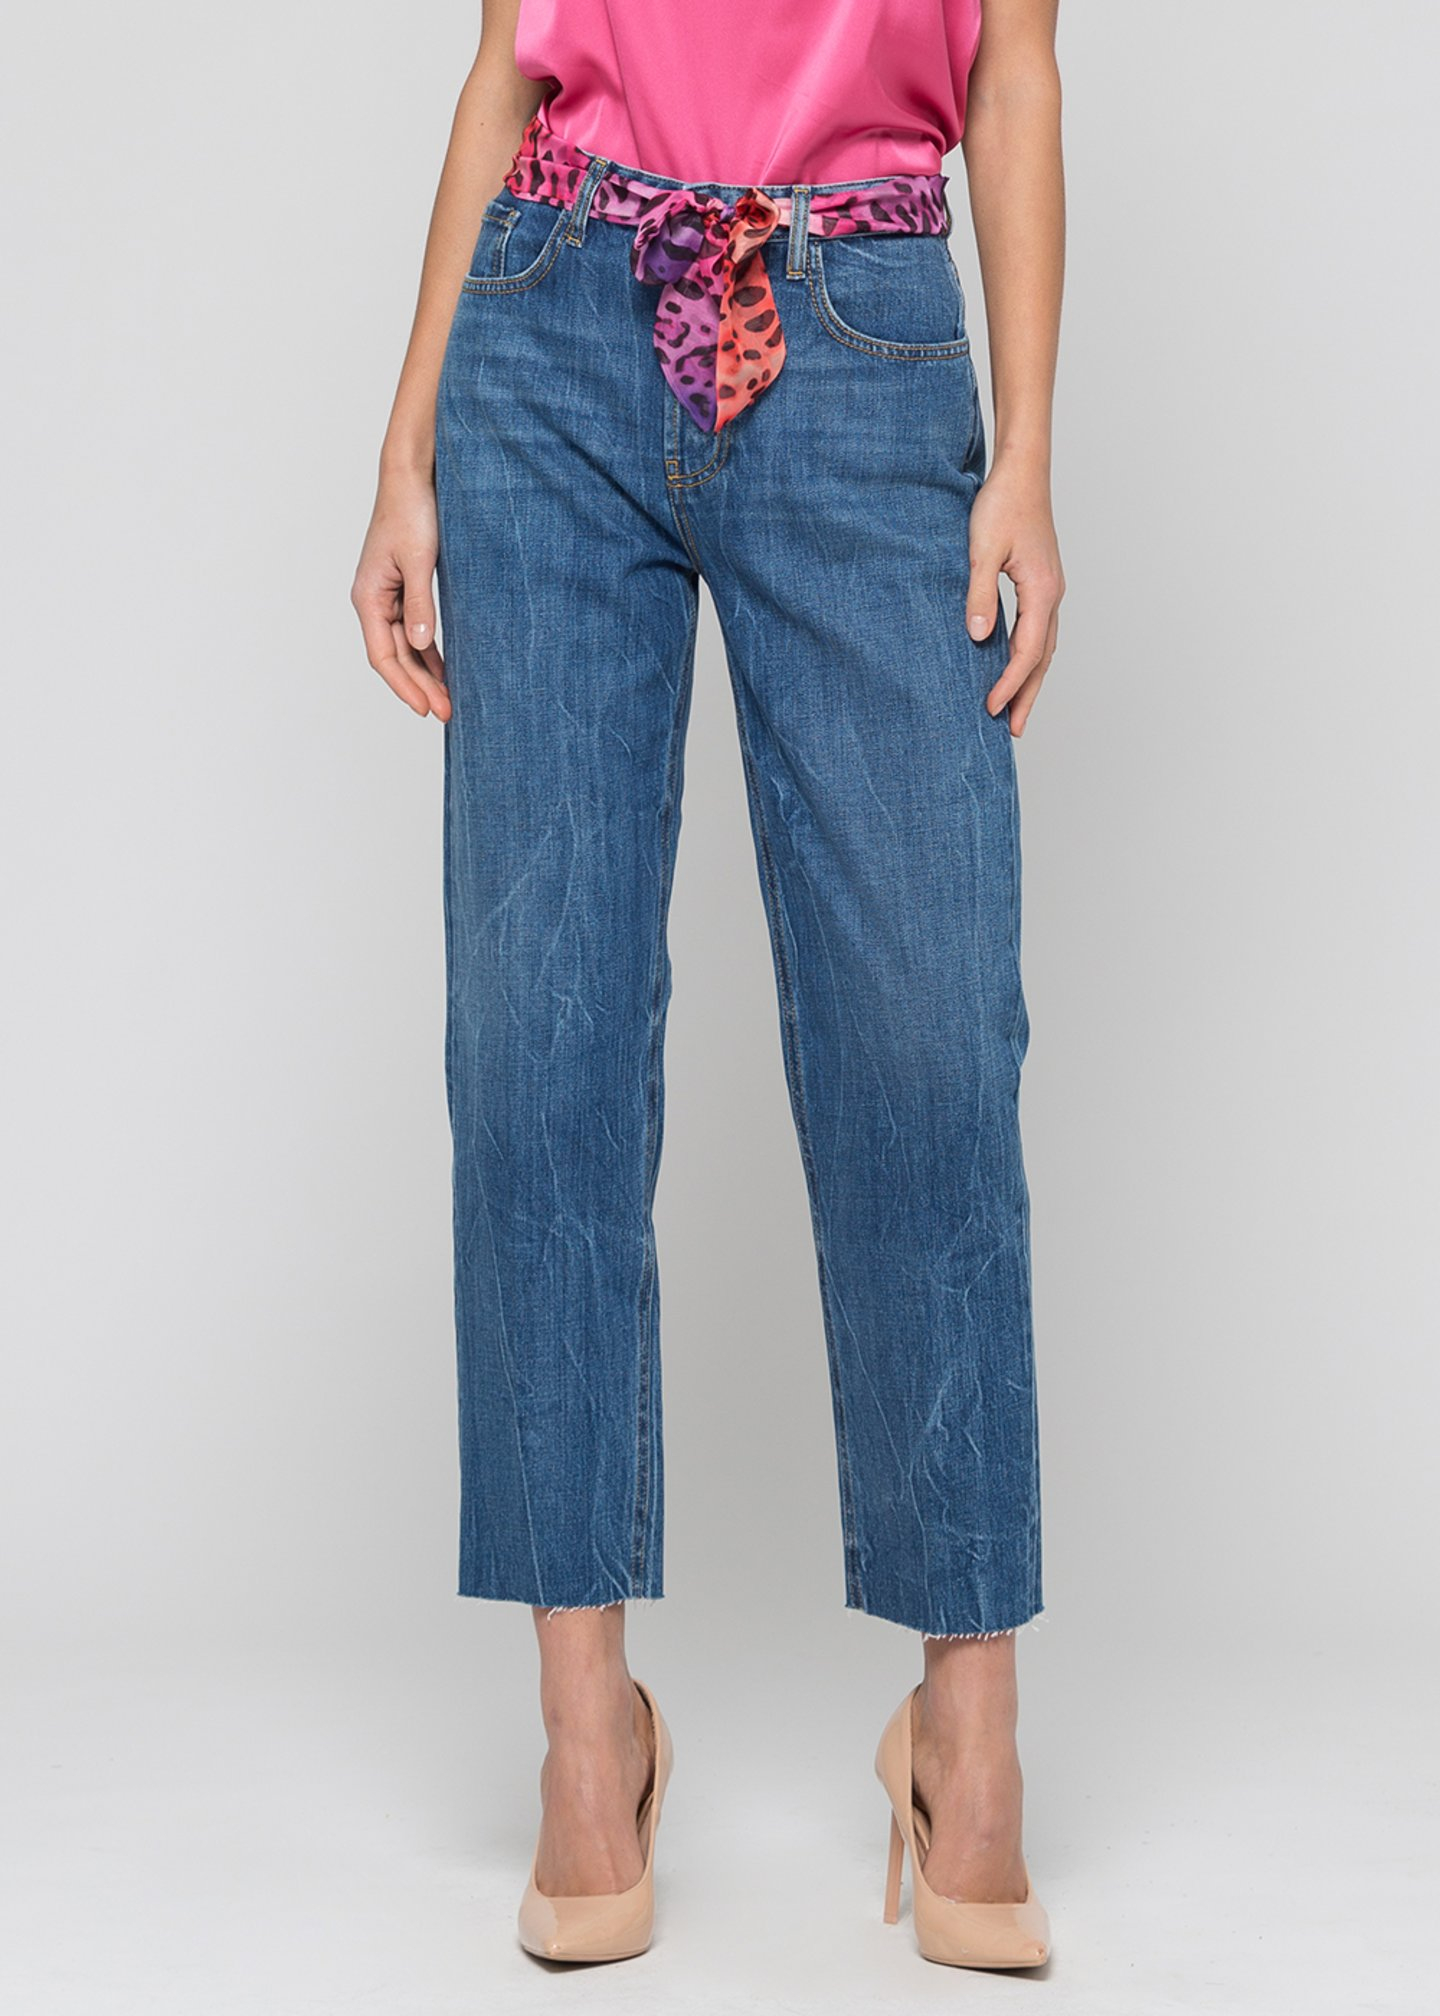 KOCCA UMA Jeans denim blu vita alta cintura fantasia